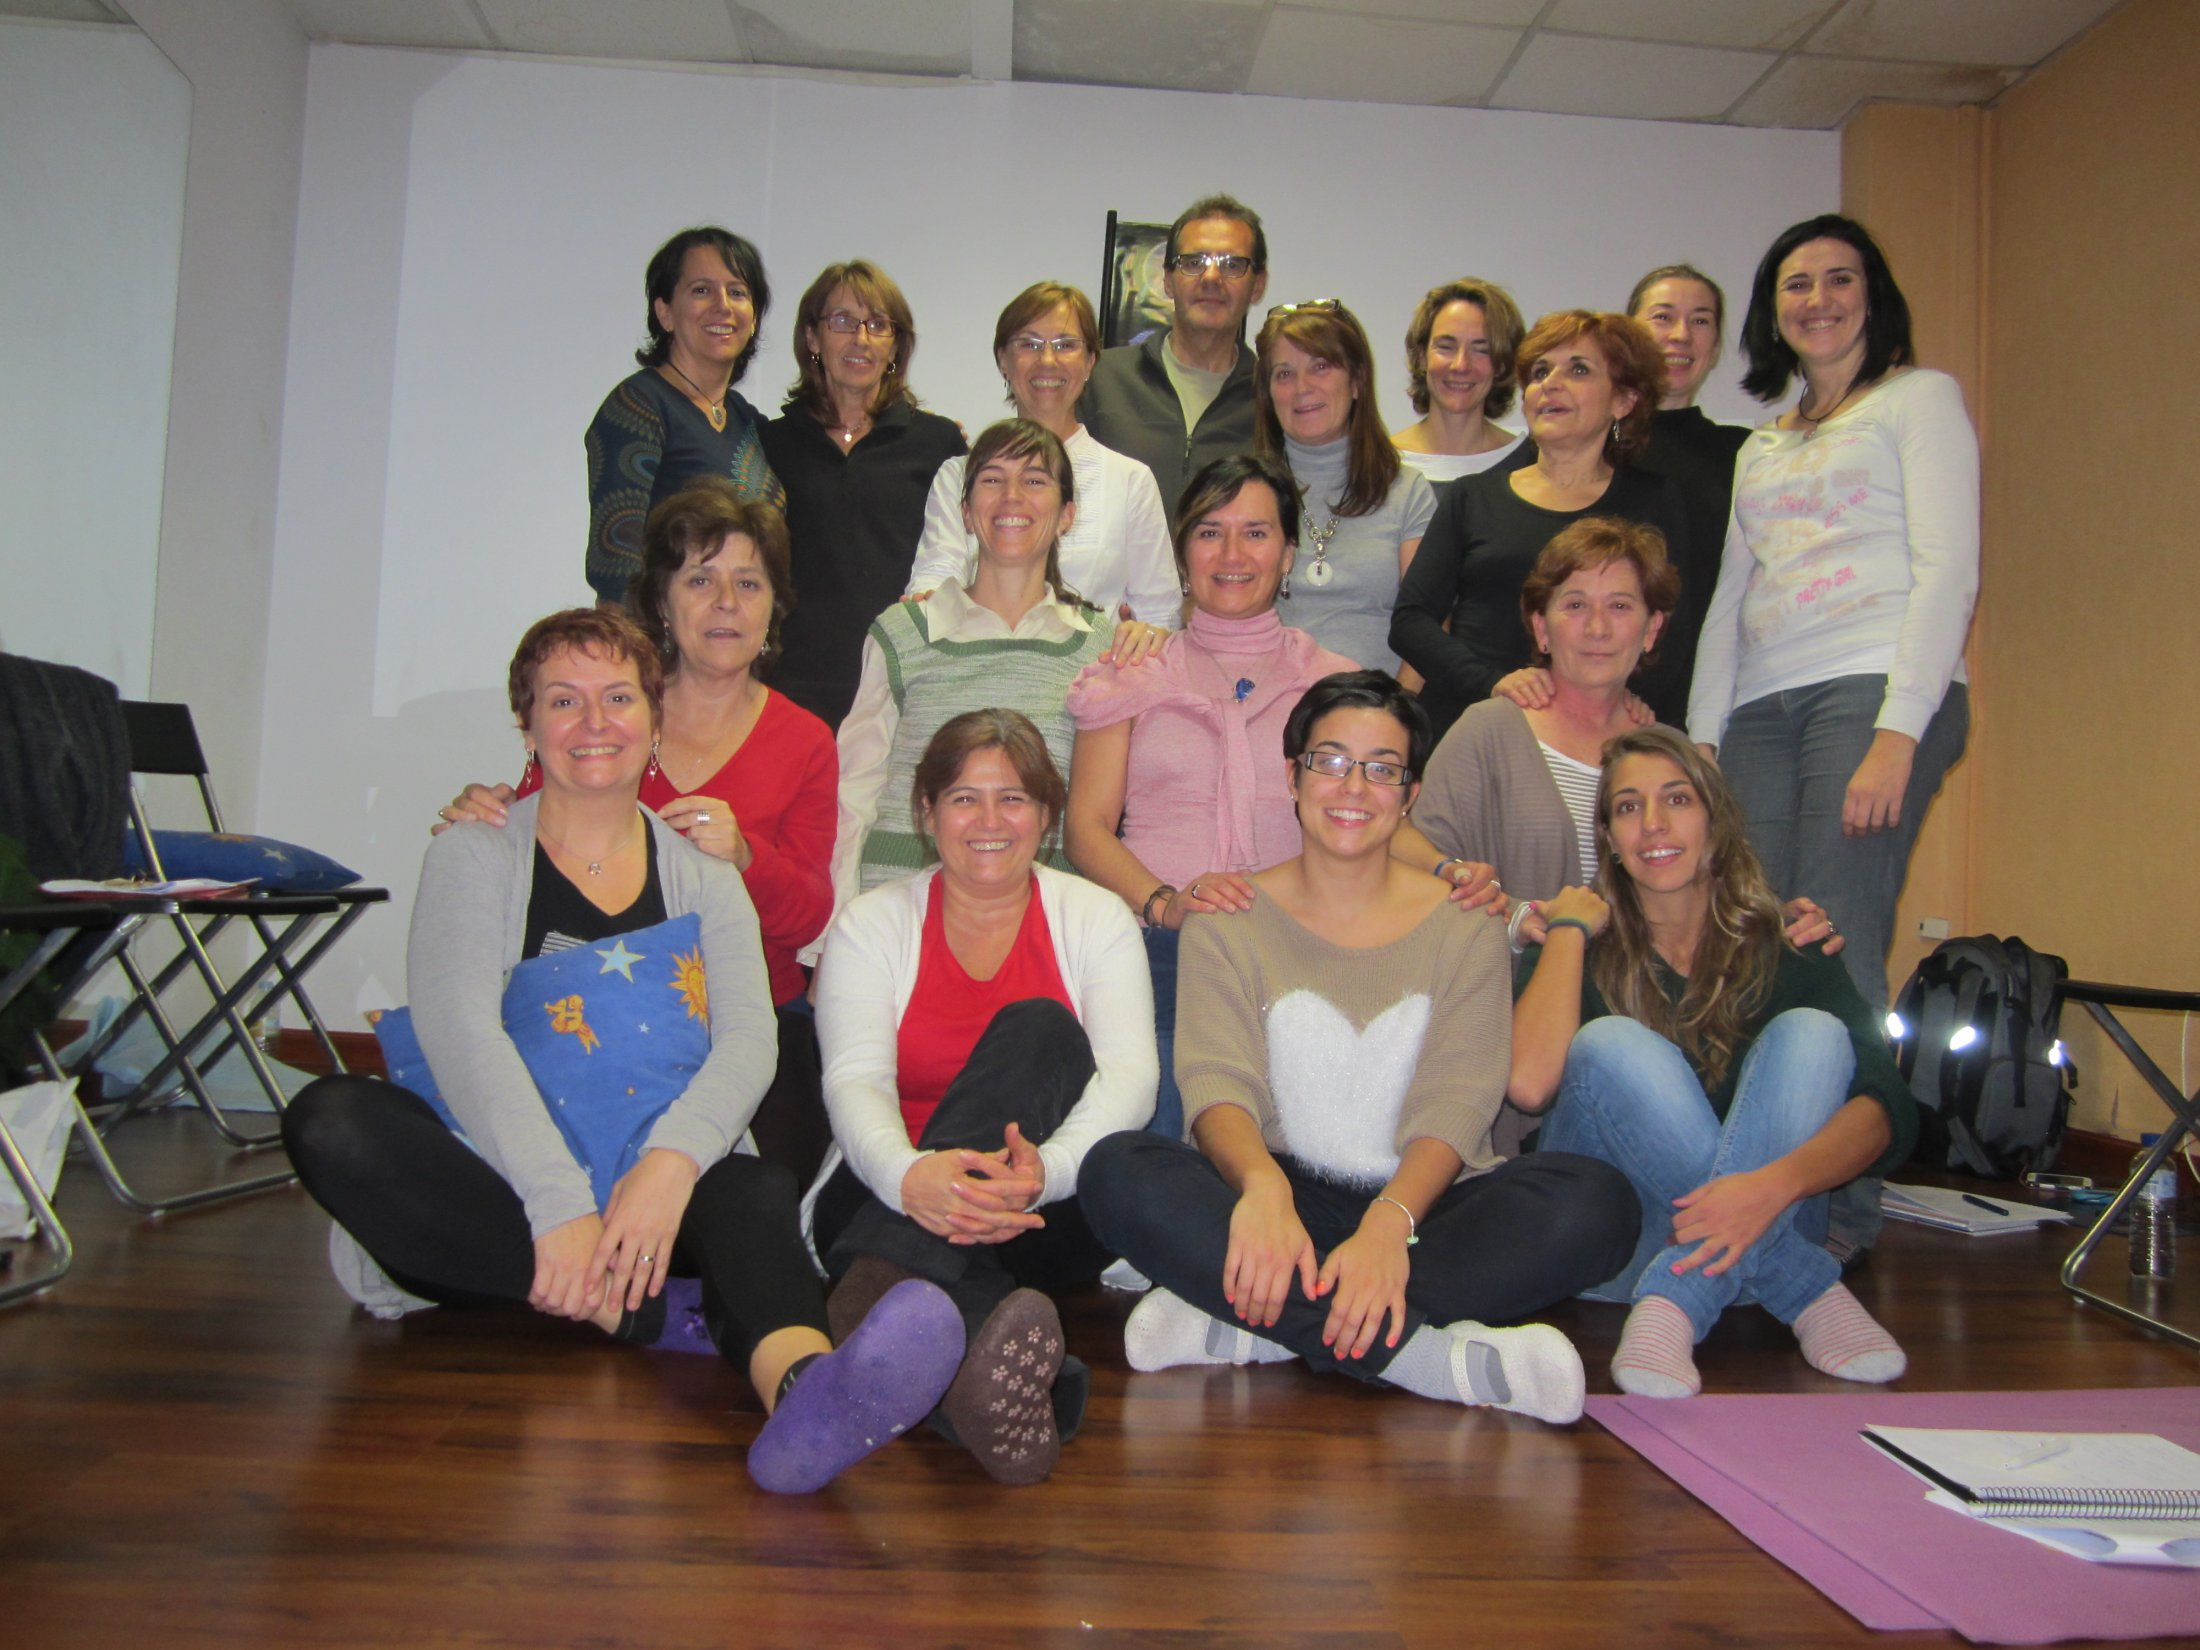 Curso EFT Tapping Madrid, noviembre 2013